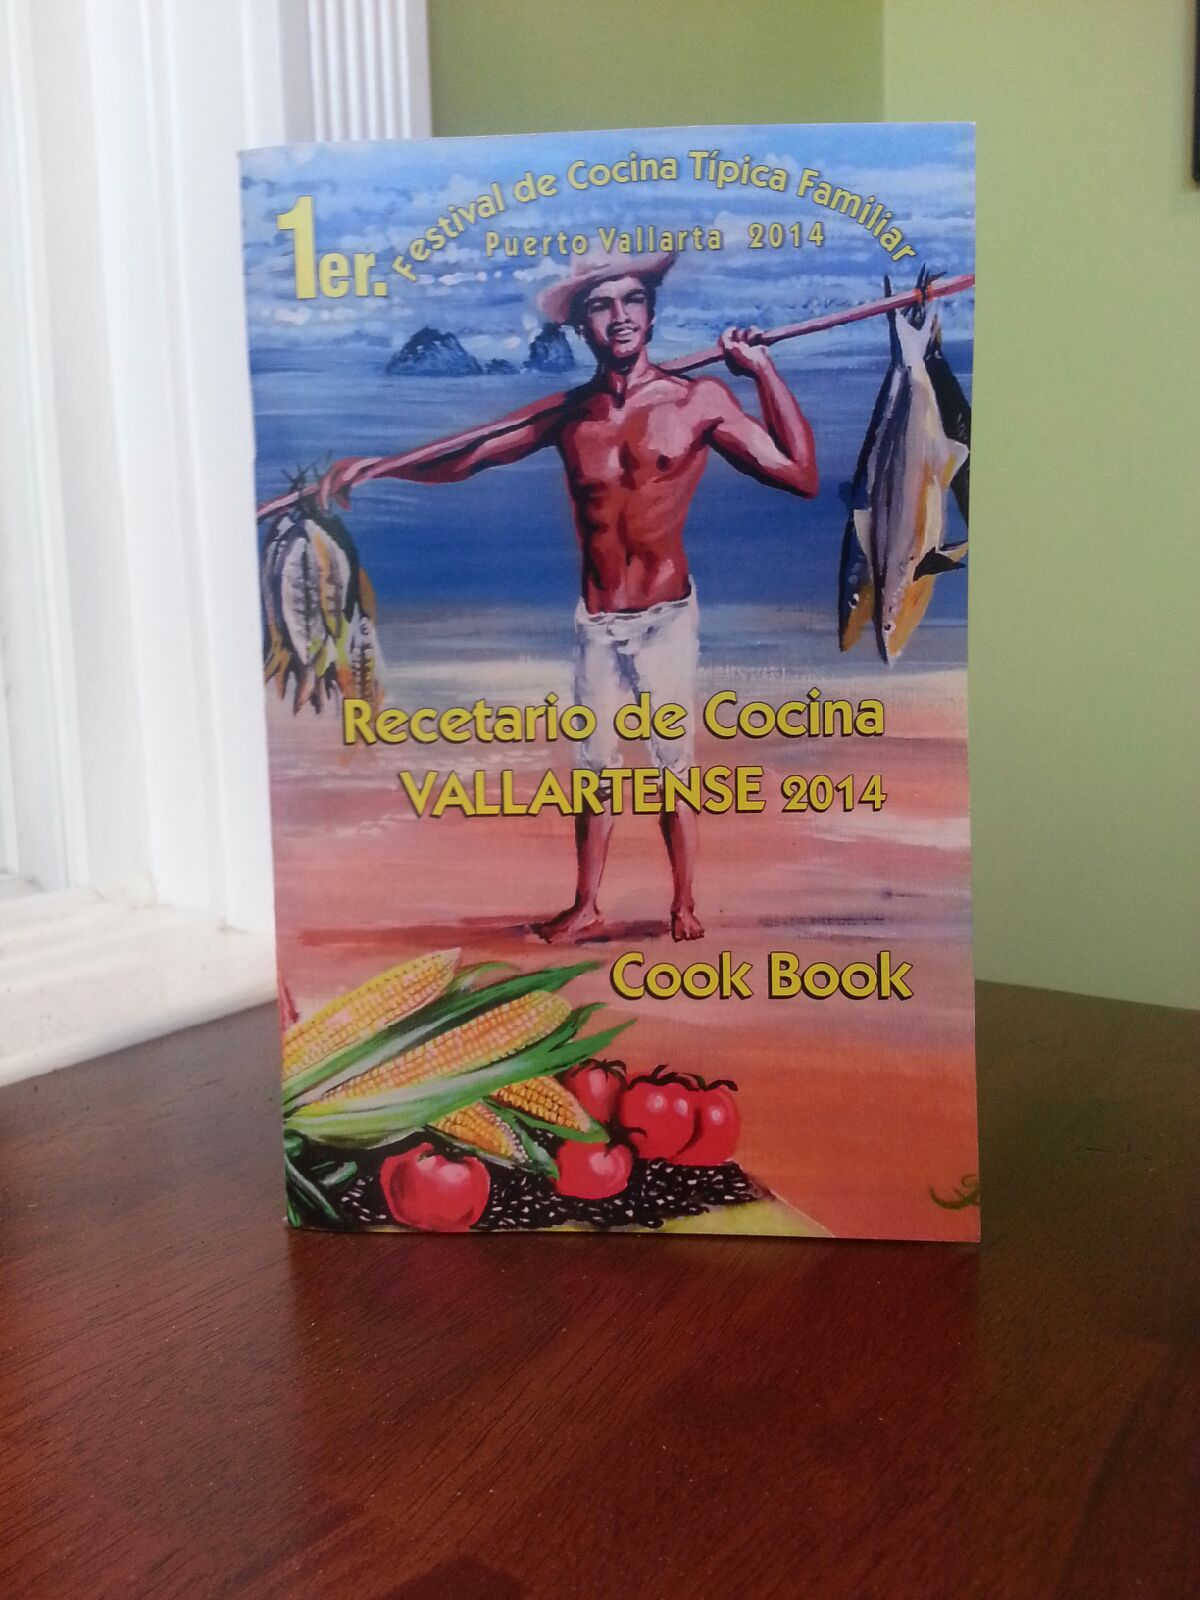 Puerto Vallarta Food Festival Cookbook